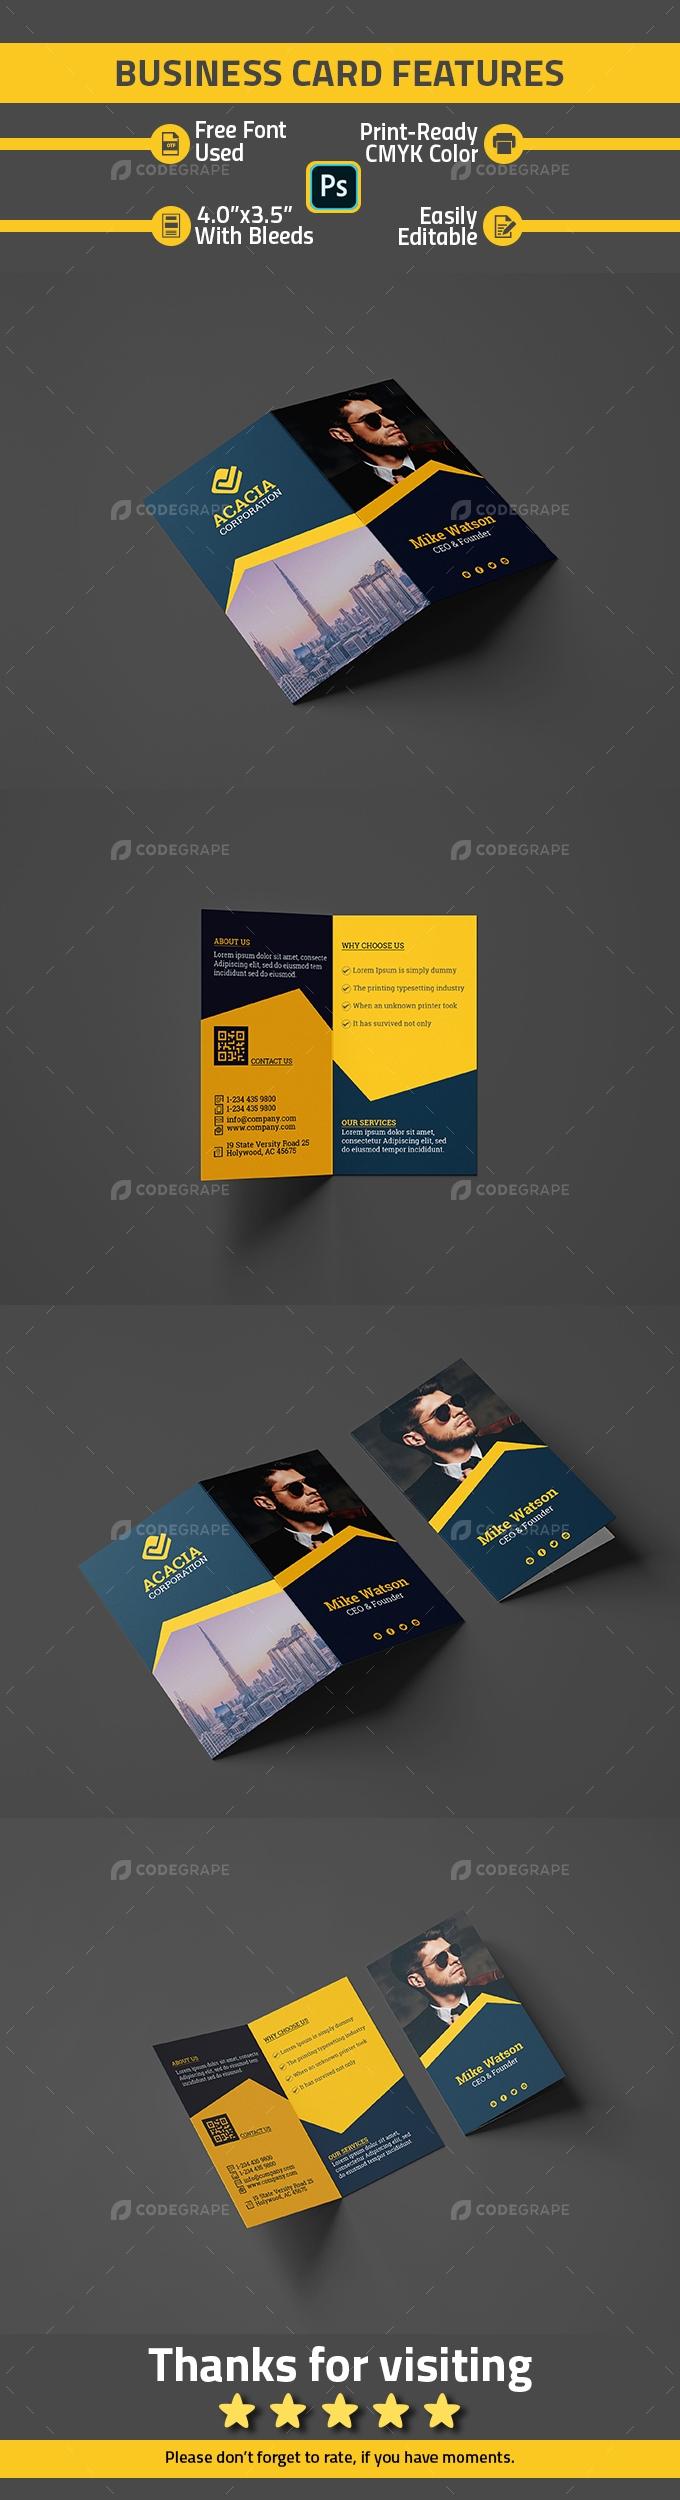 Stylish Professional Folded Business Card